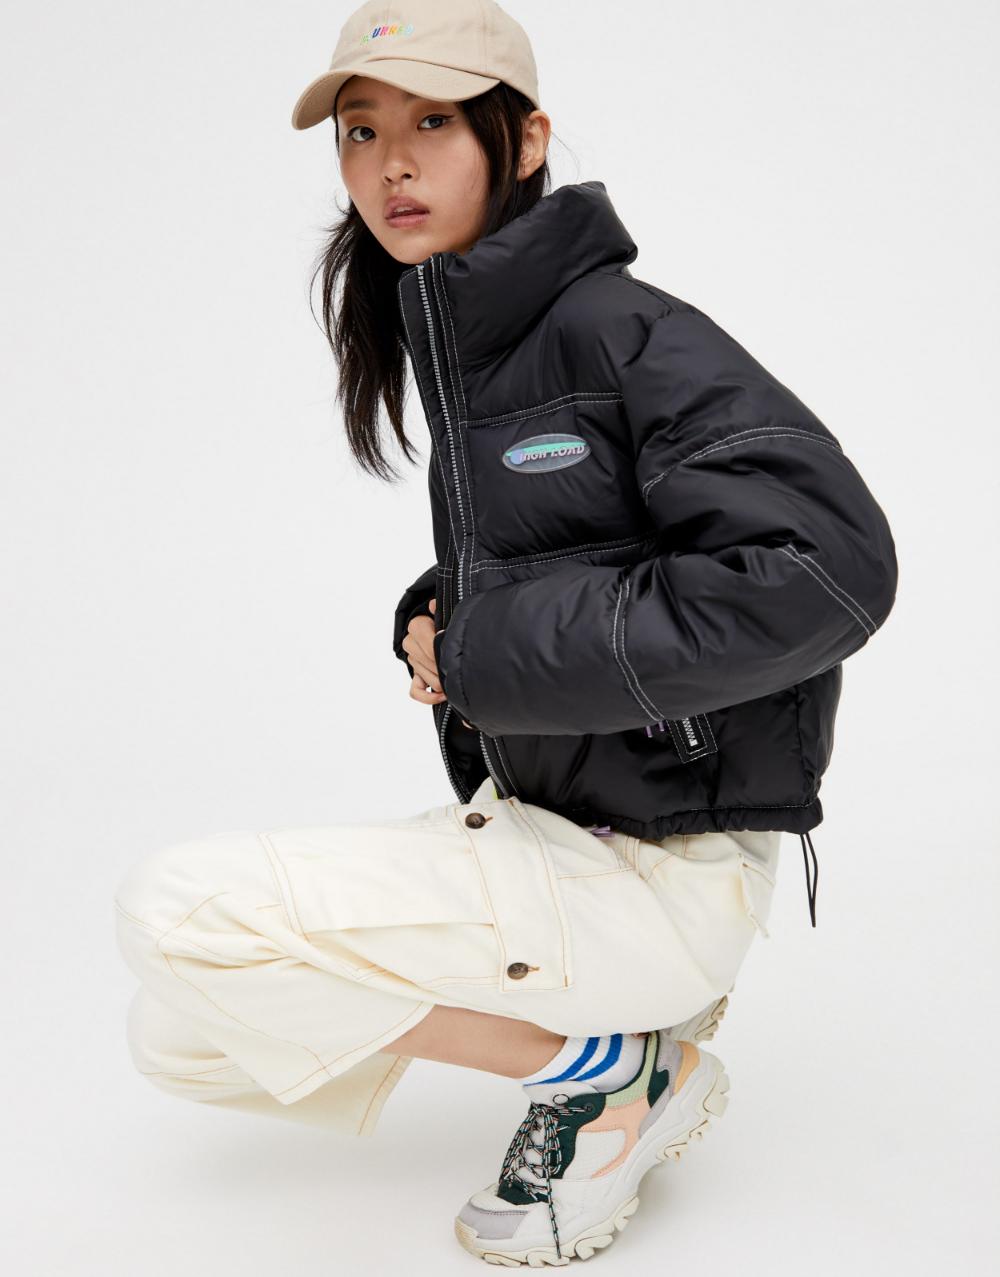 Cropped High Collar Puffer Jacket Pull Bear High Collar Puffer Jackets Spring Outerwear Women [ 1277 x 1000 Pixel ]